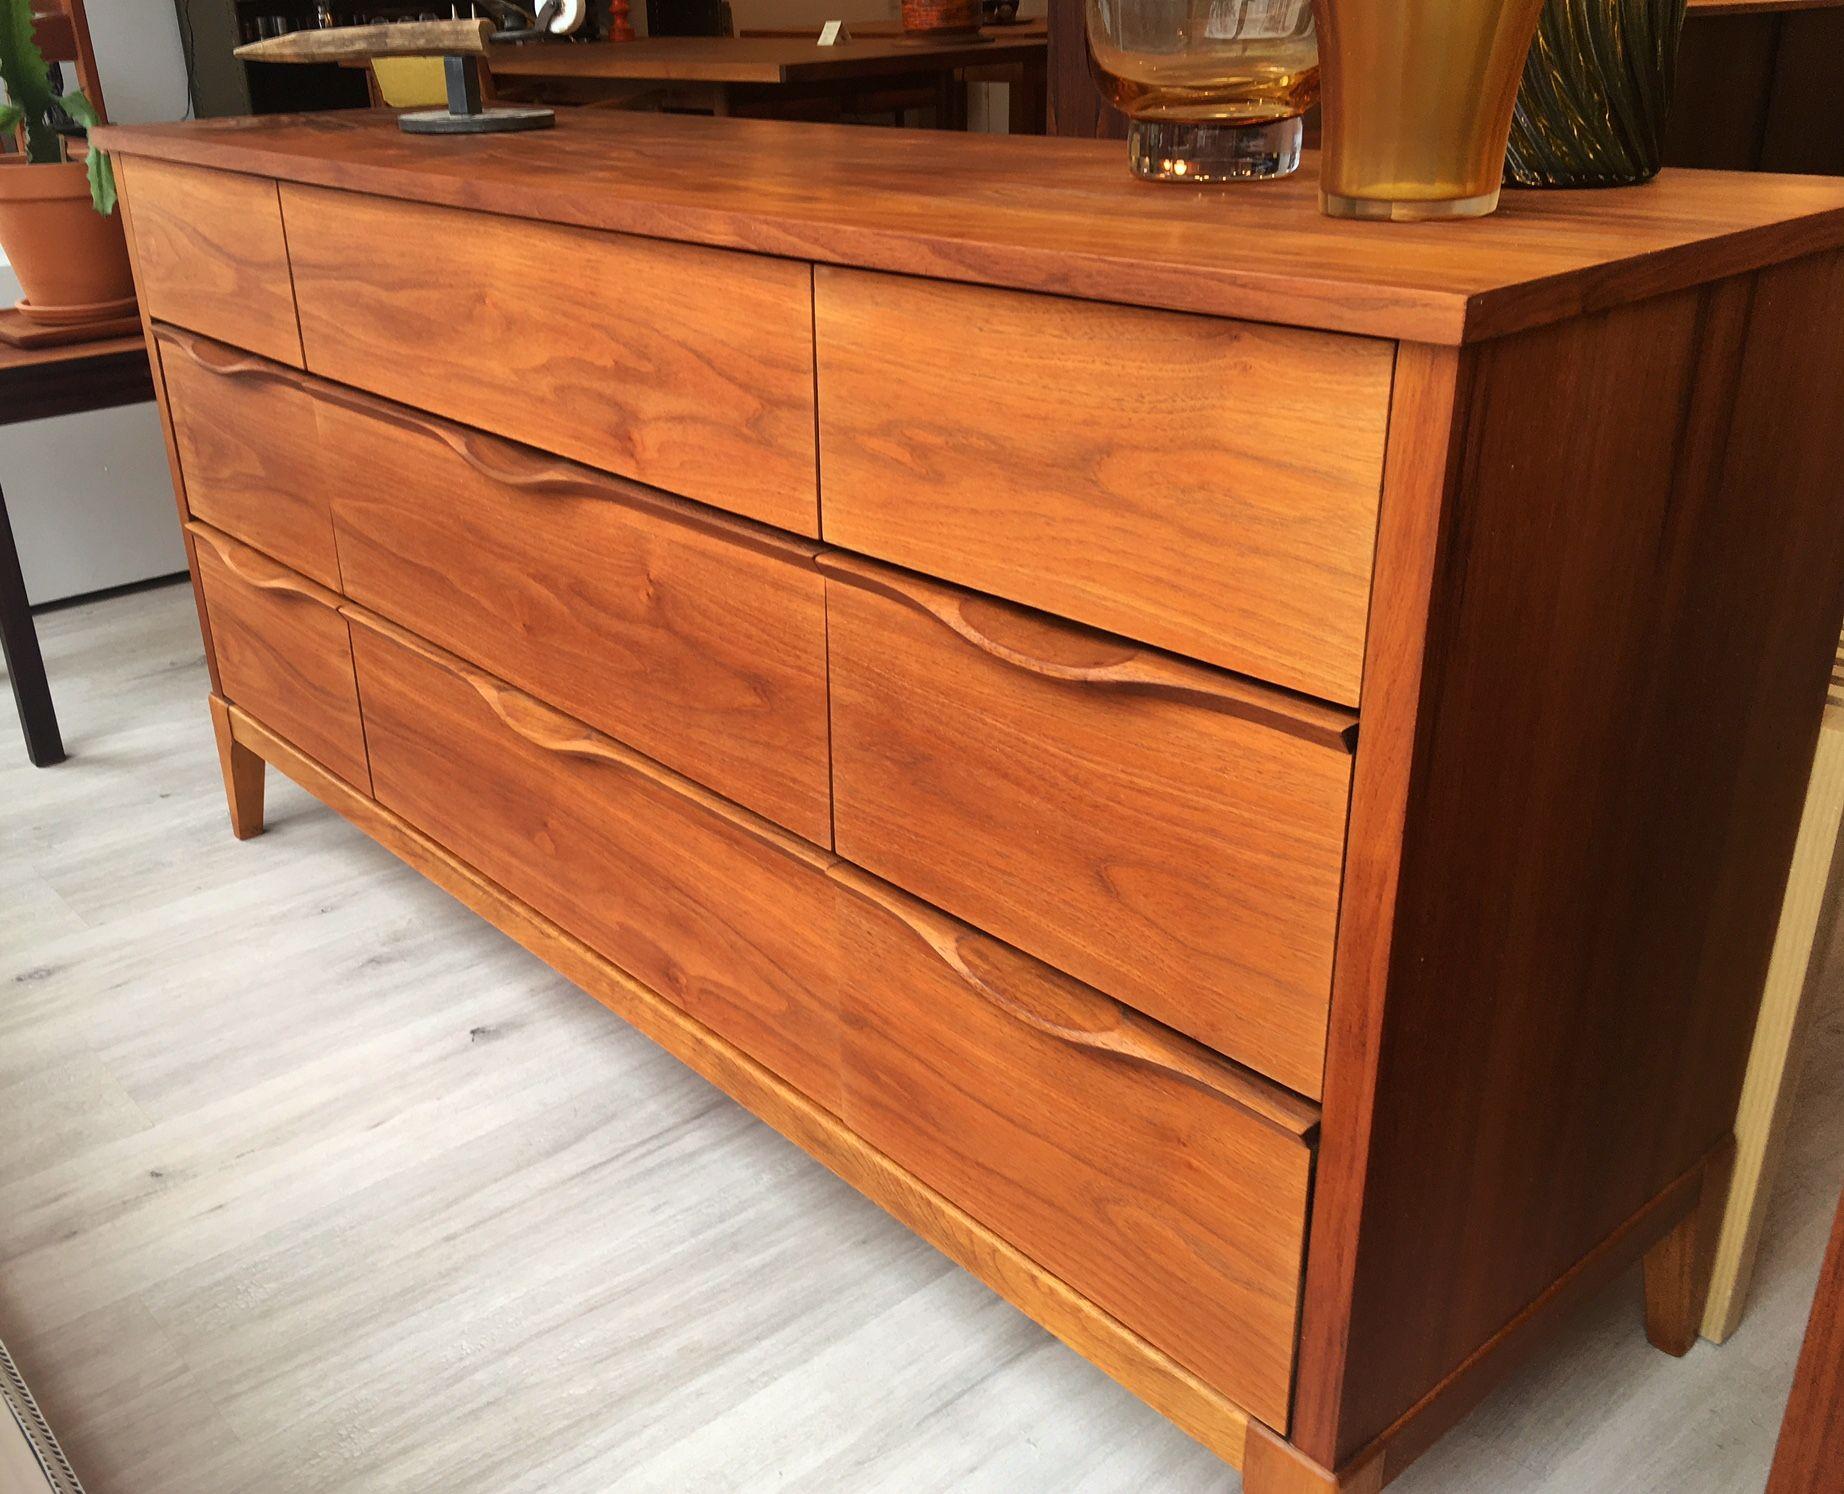 Petite Commode 9 Tiroirs Mid Century En Noyer Restaure 58 75 X 17 25 X 30 25 H Chezlamothe Com Home Decor Decor Furniture